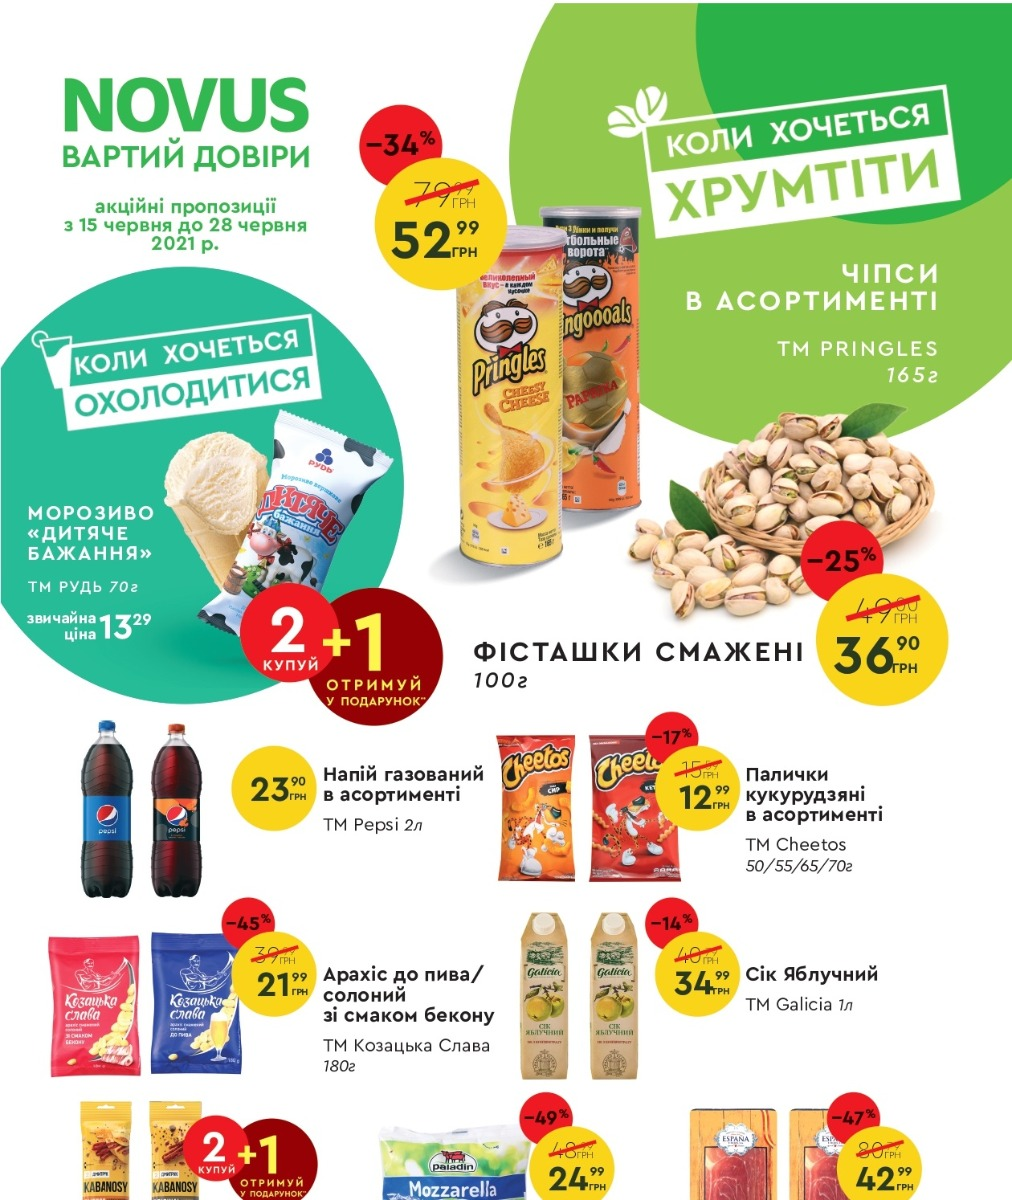 Novus booklet image